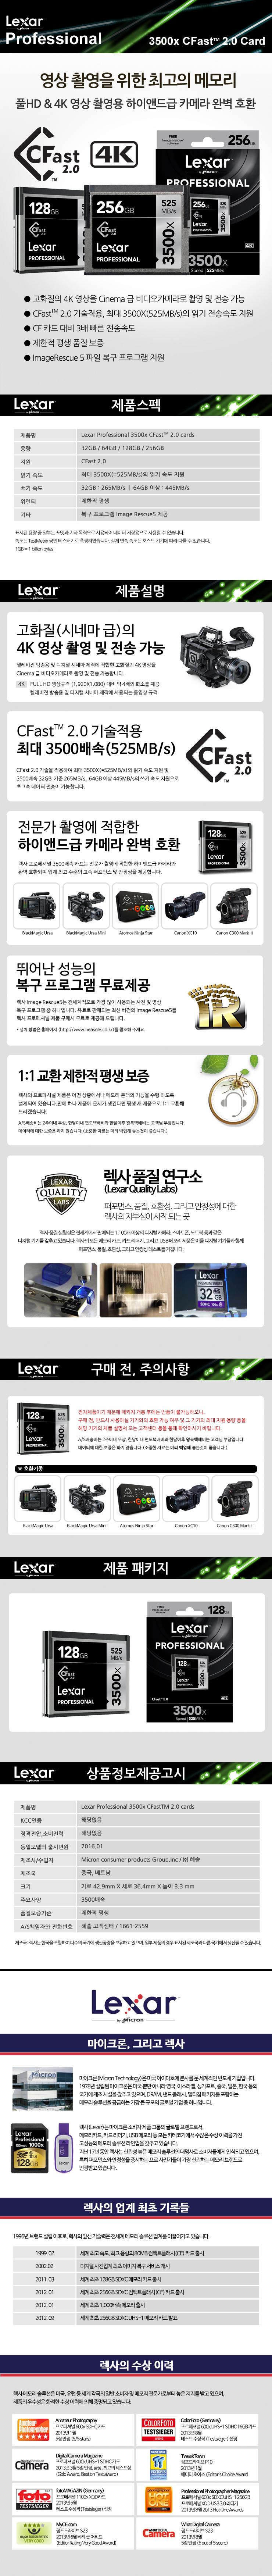 Lexar  CFAST 2.0 Professional 3500X(64GB)